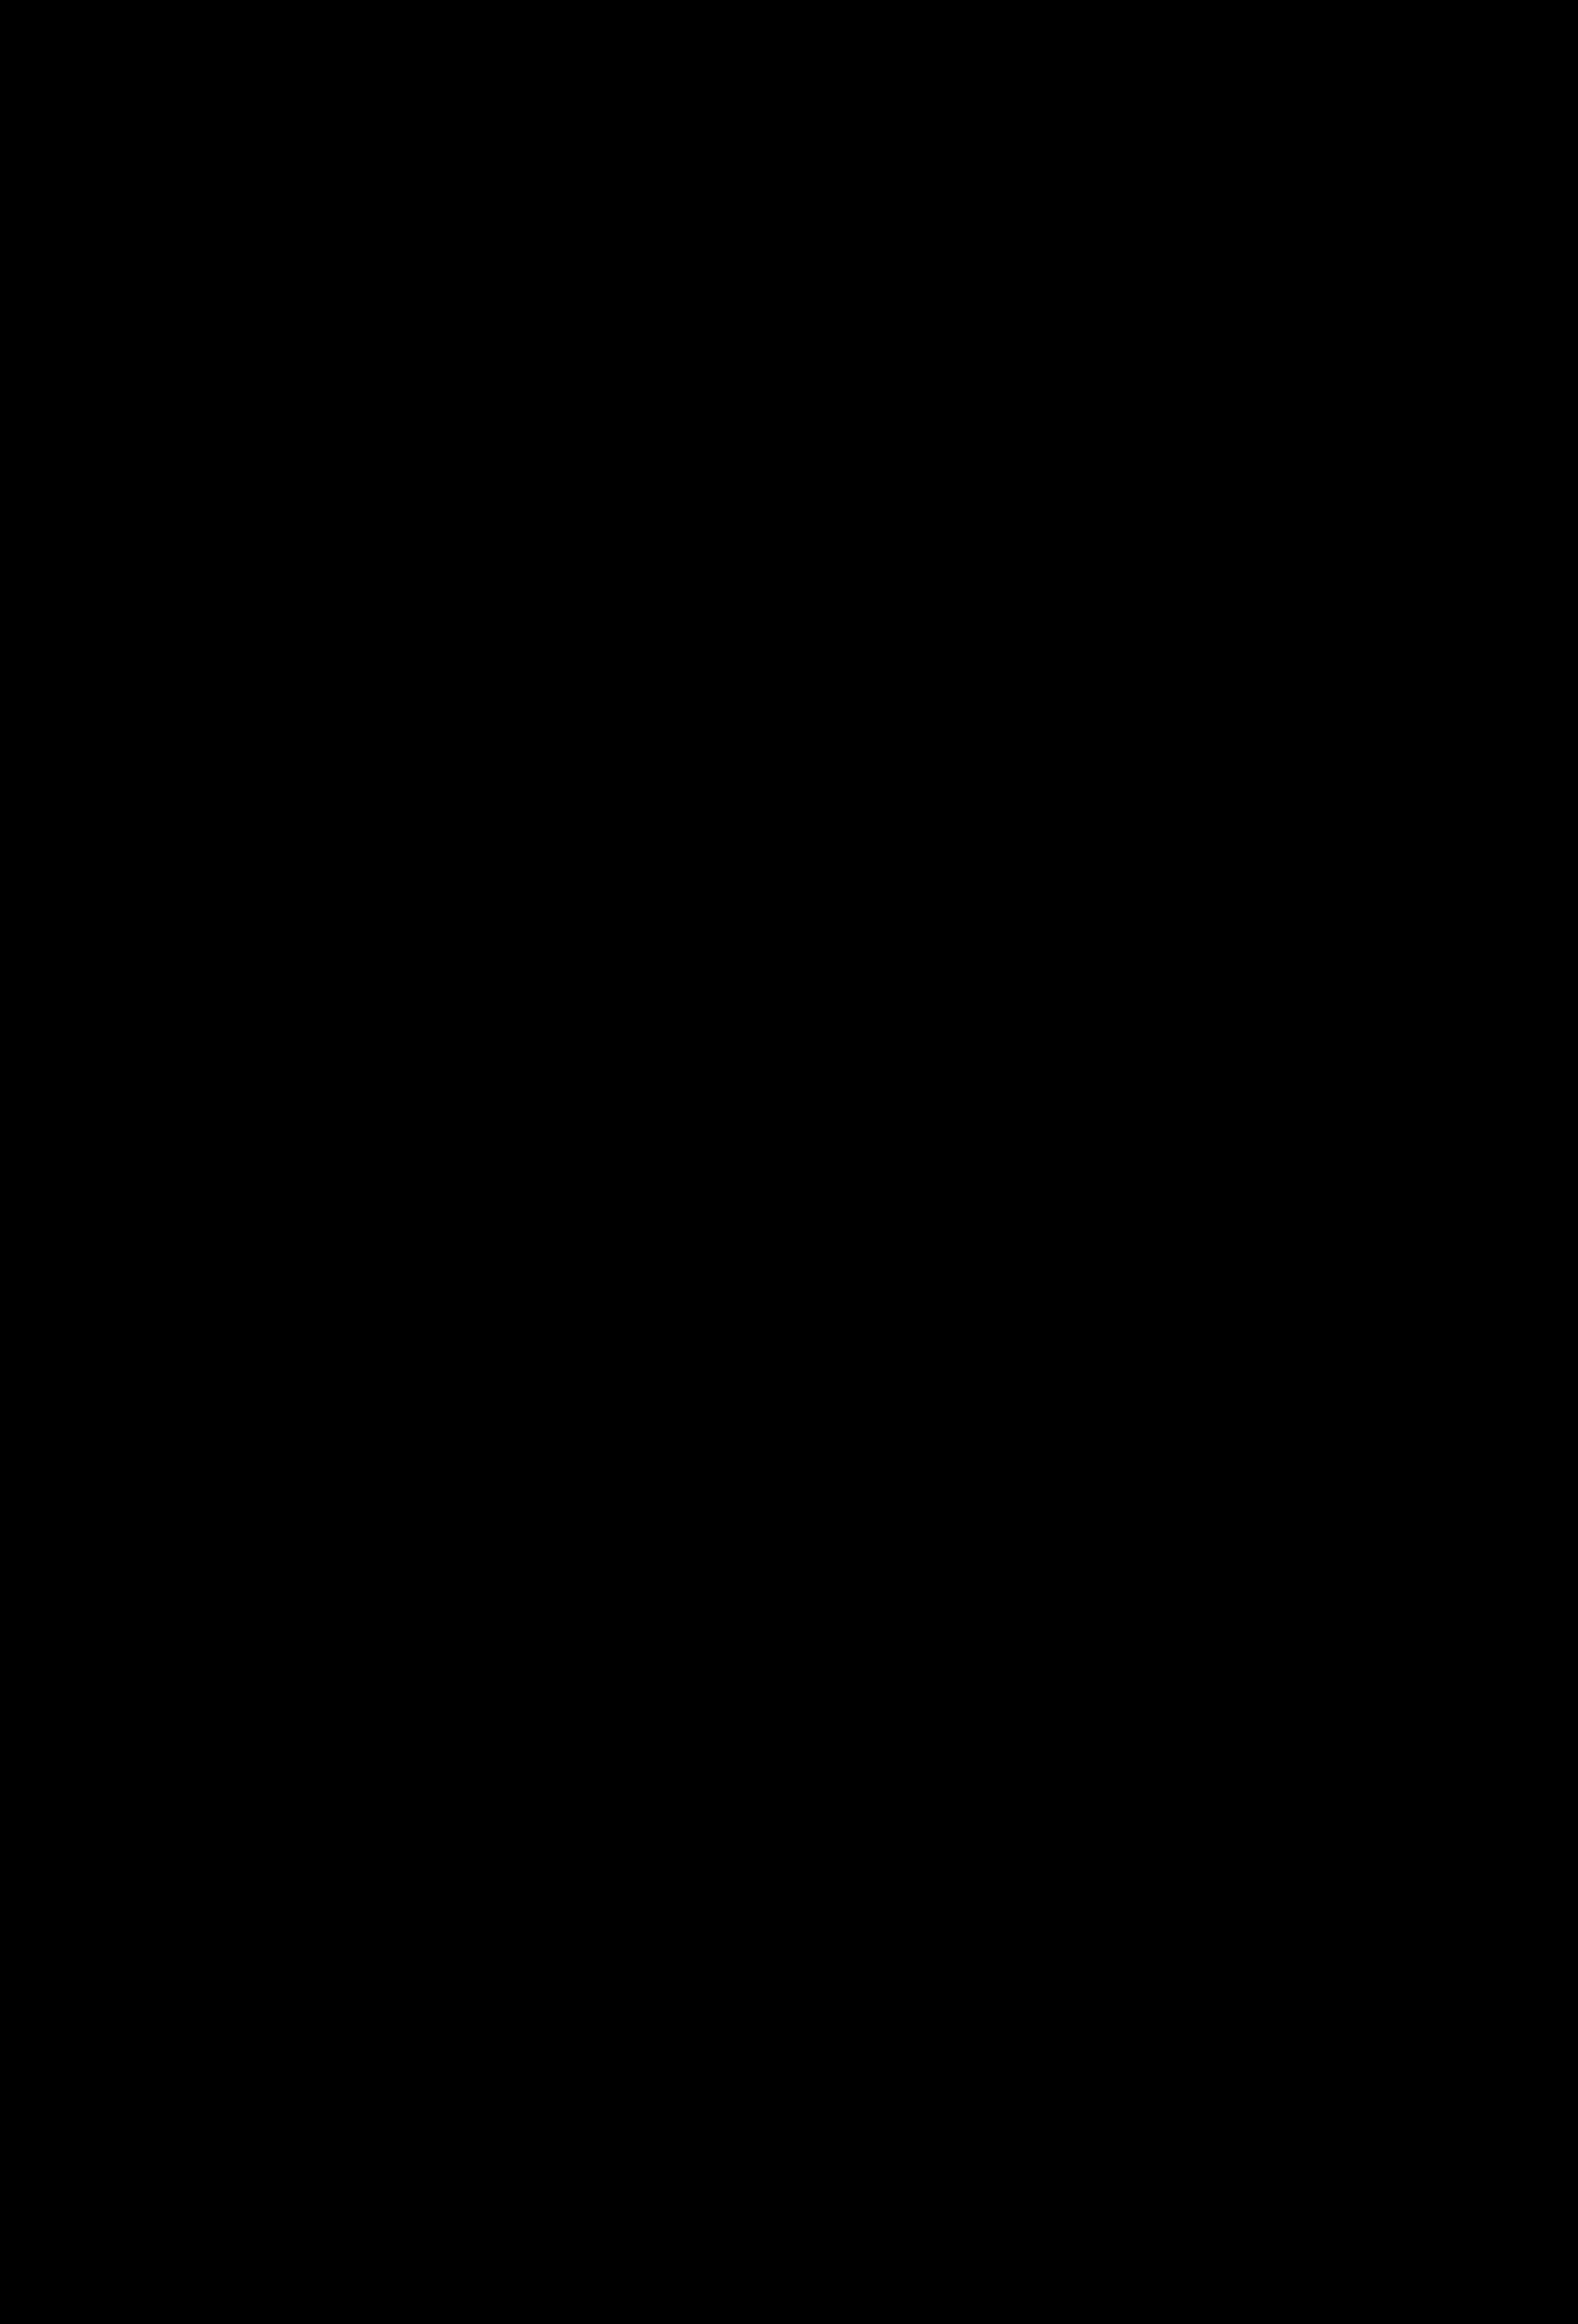 Bram de Vries